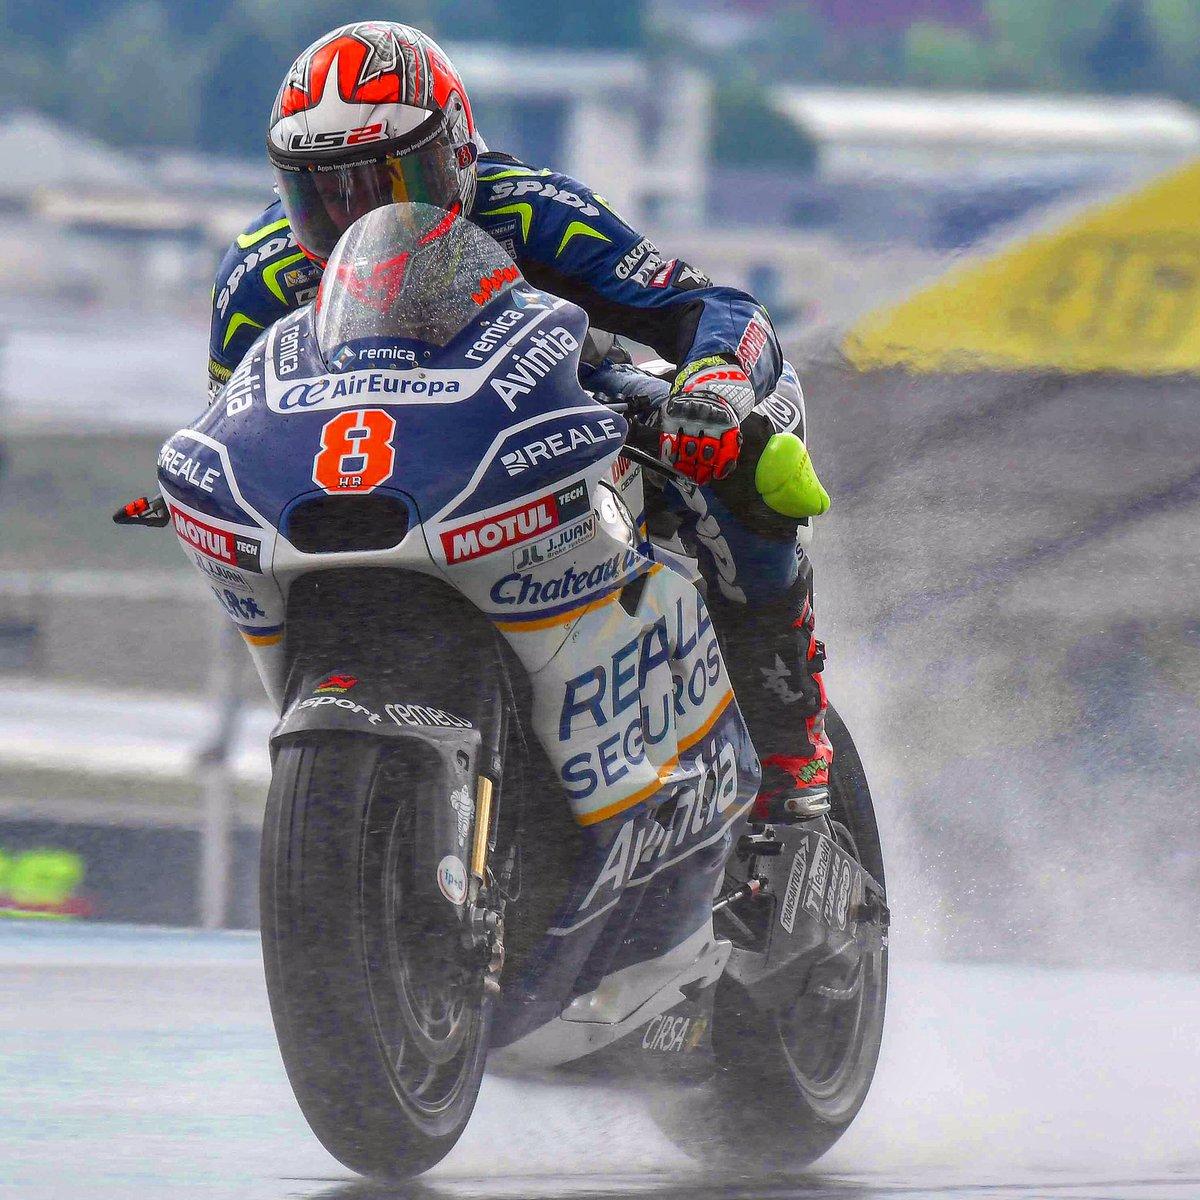 Rainy day @HectorBarbera #FrenchGP @MotoGP @realeavintia #speed #bikes #bikers #race #spidiwarrior #ridetrue